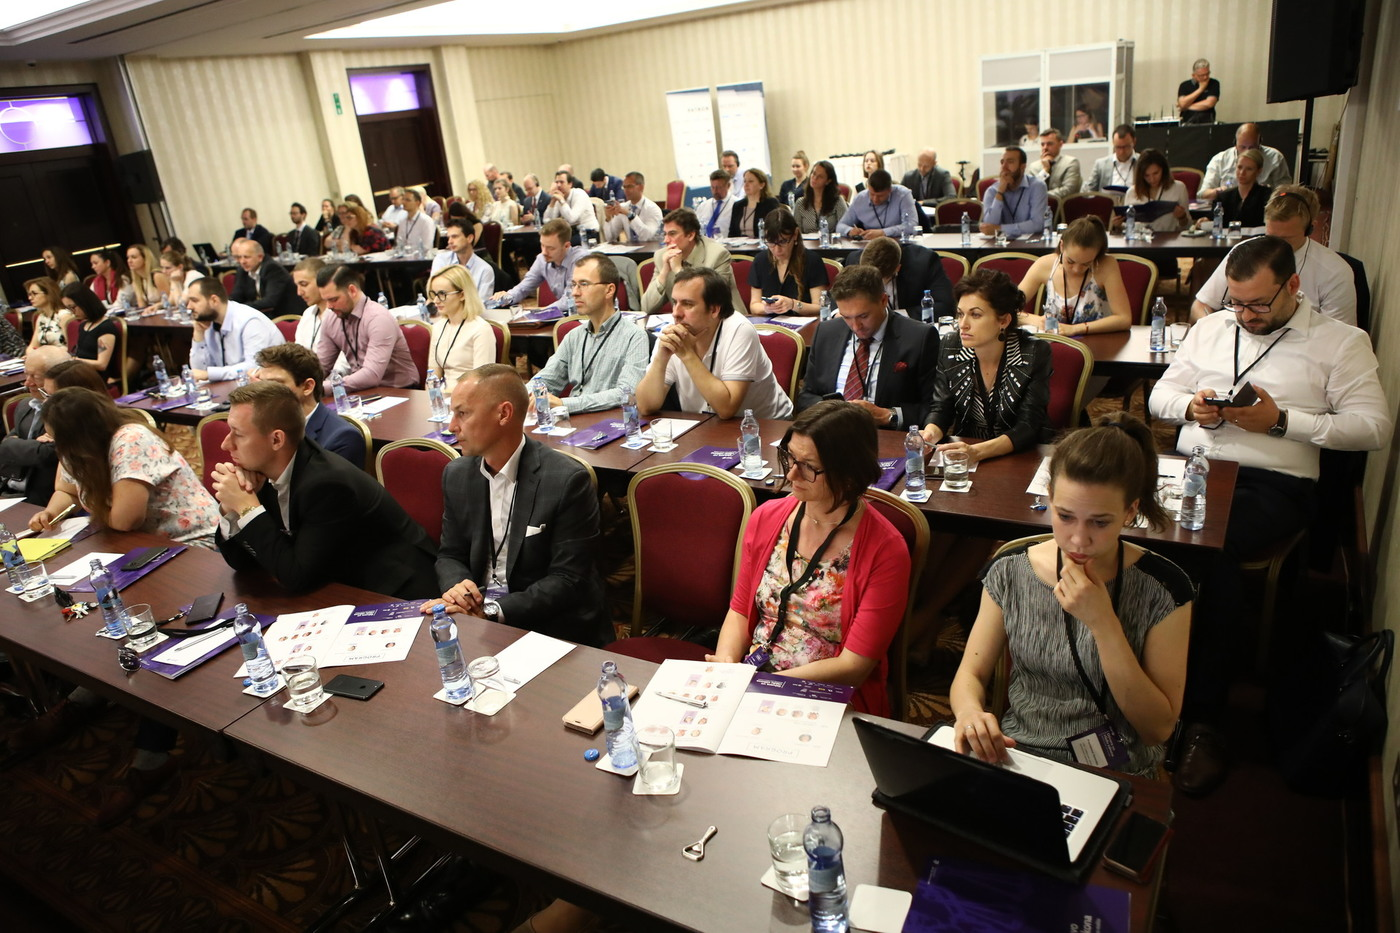 Seminar/Conference